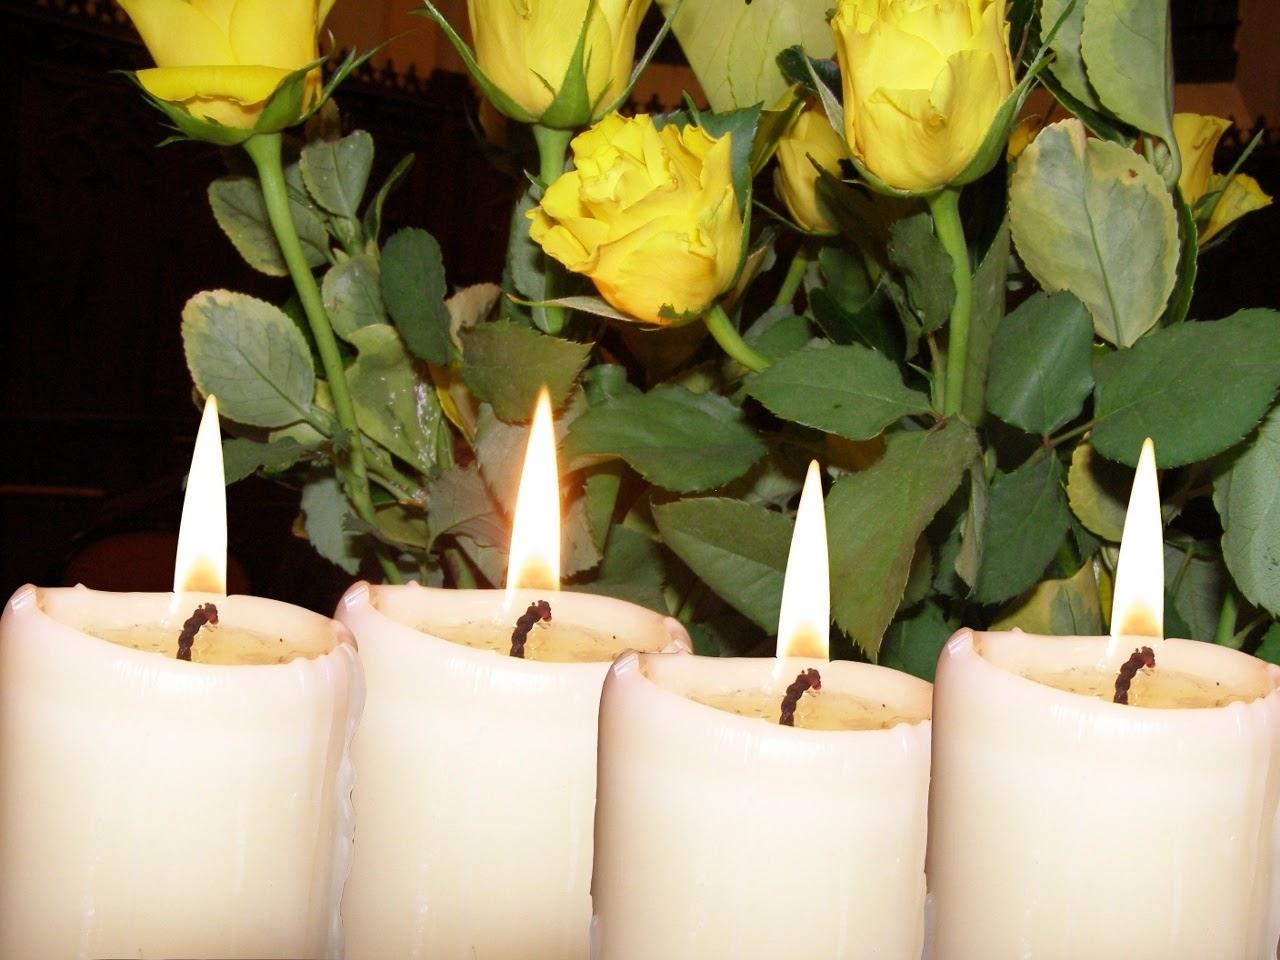 Les quatre bougies de l'Avent